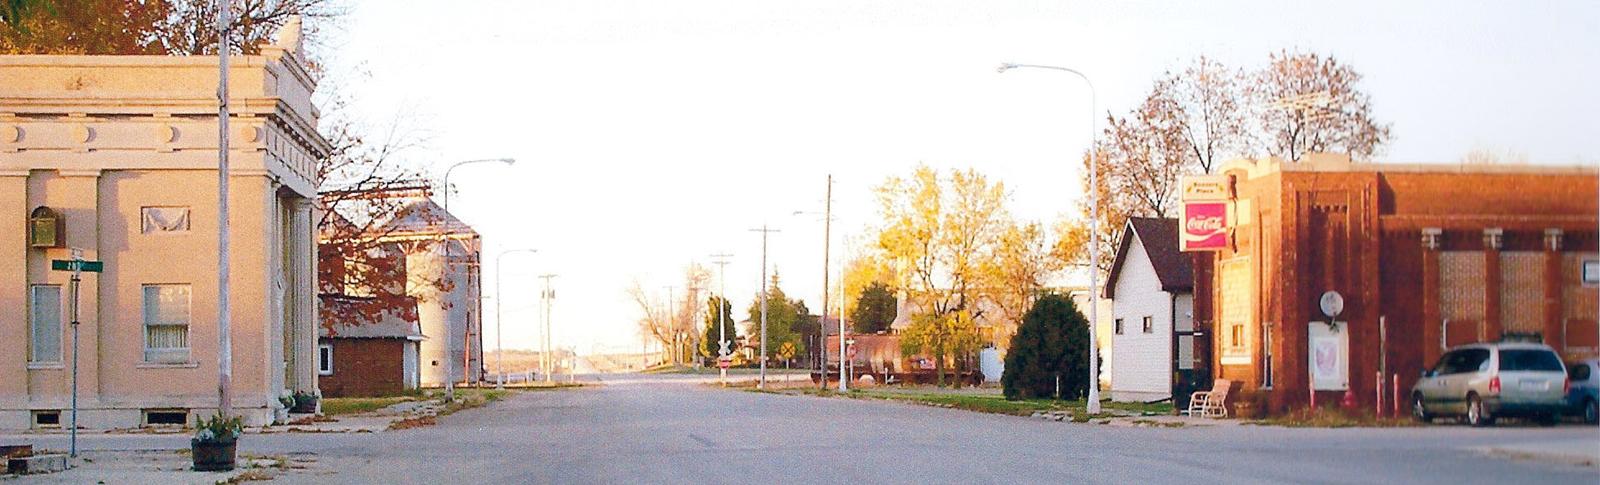 Hanlontown